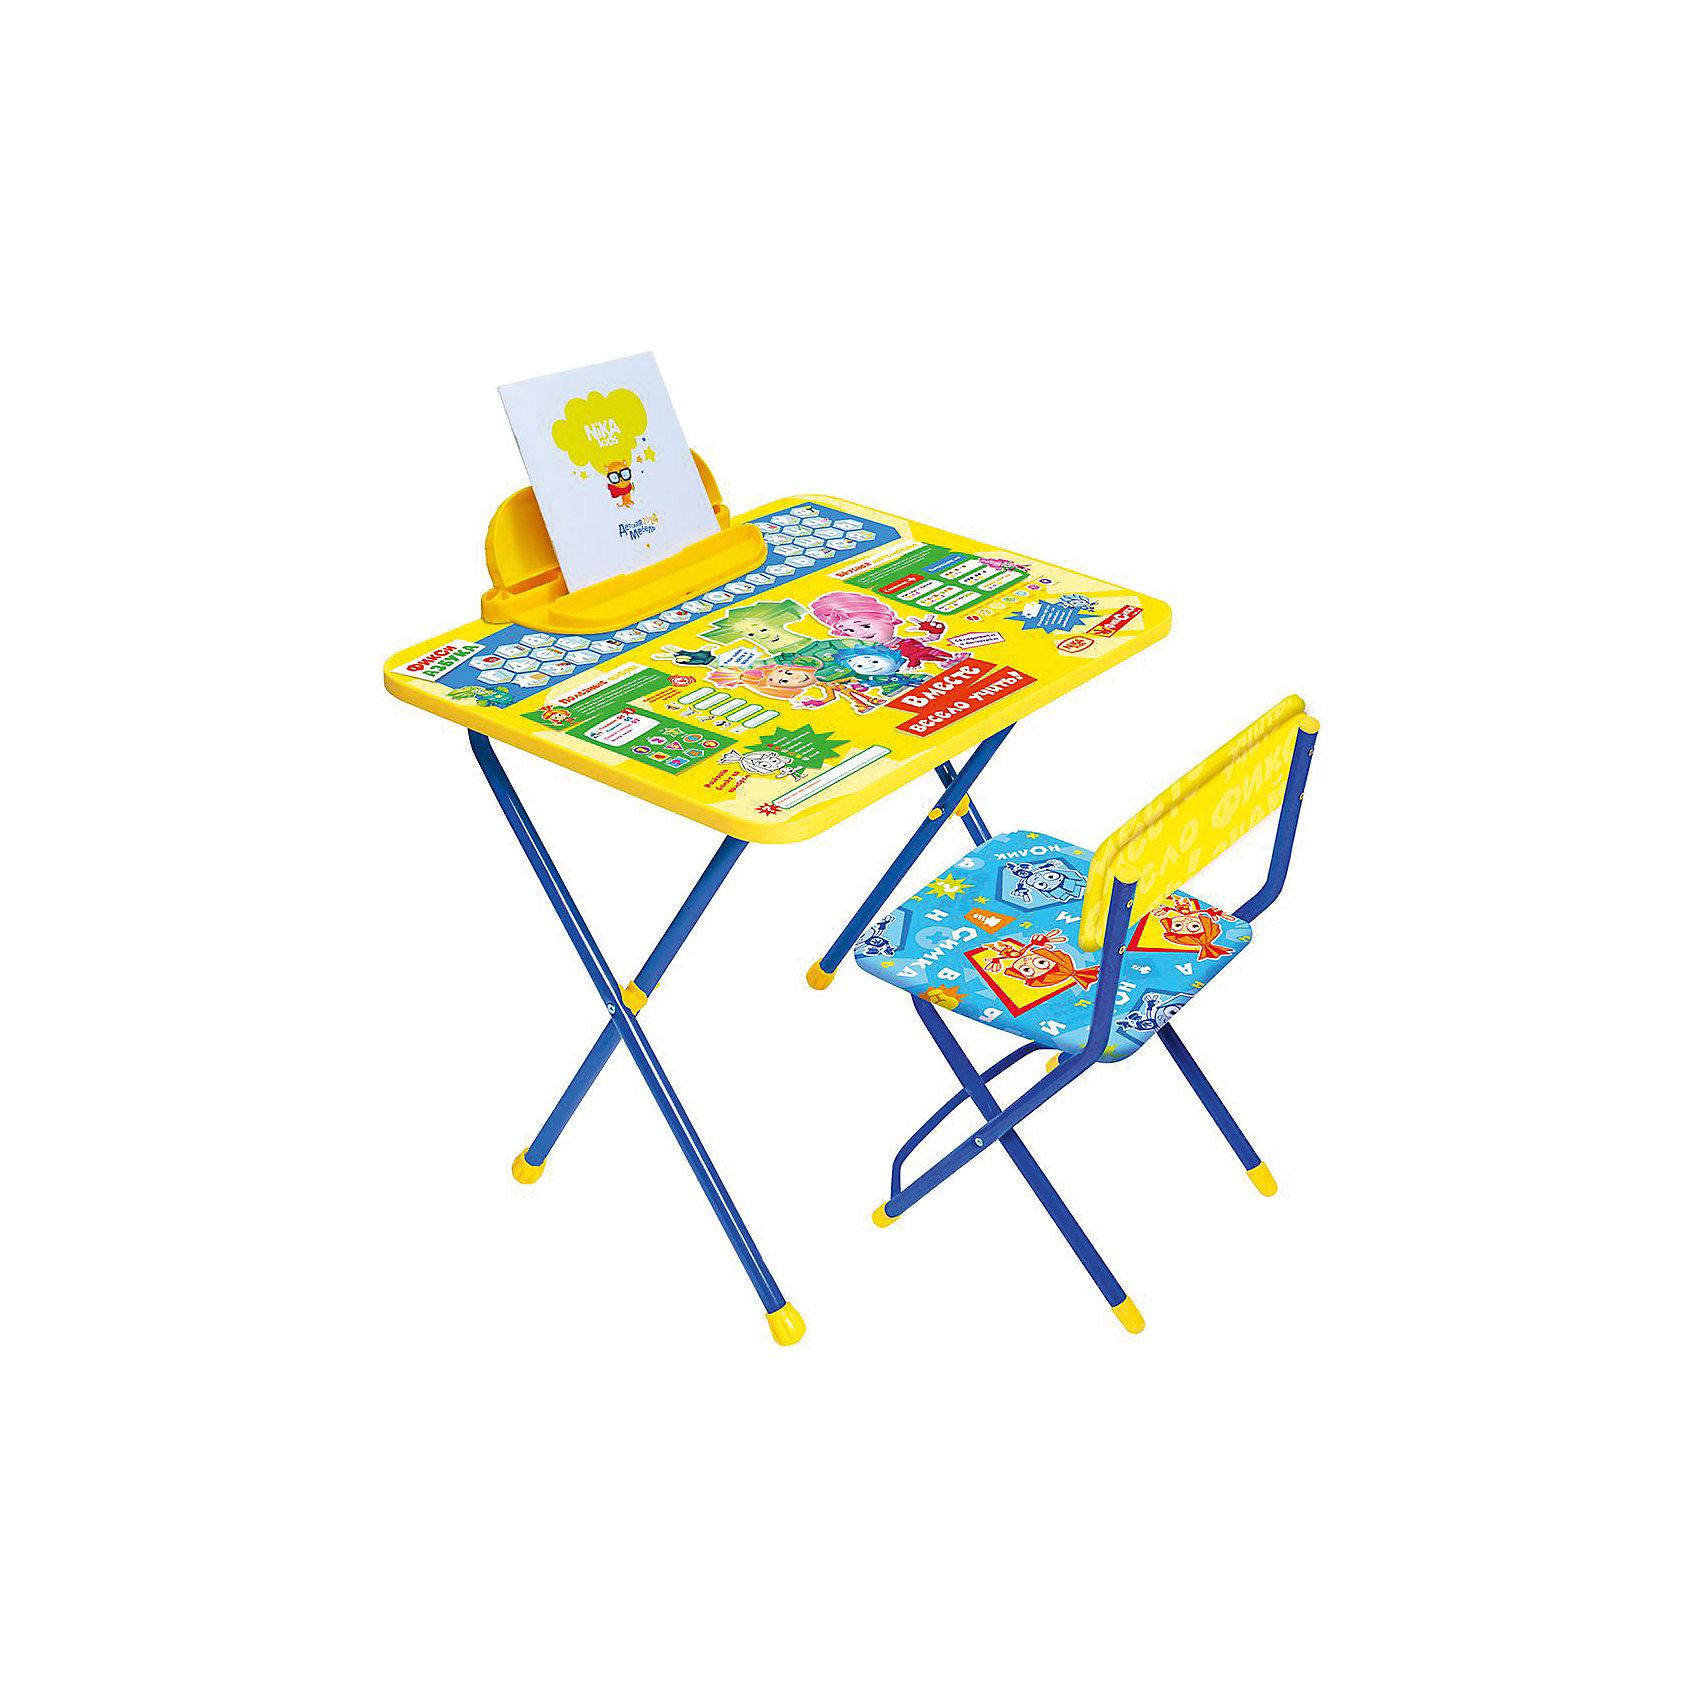 Ника Набор мебели Ф1А . Фикси Азбука, Ника регулируемое расширение стола до 600 мм twx7ss triton tr267729